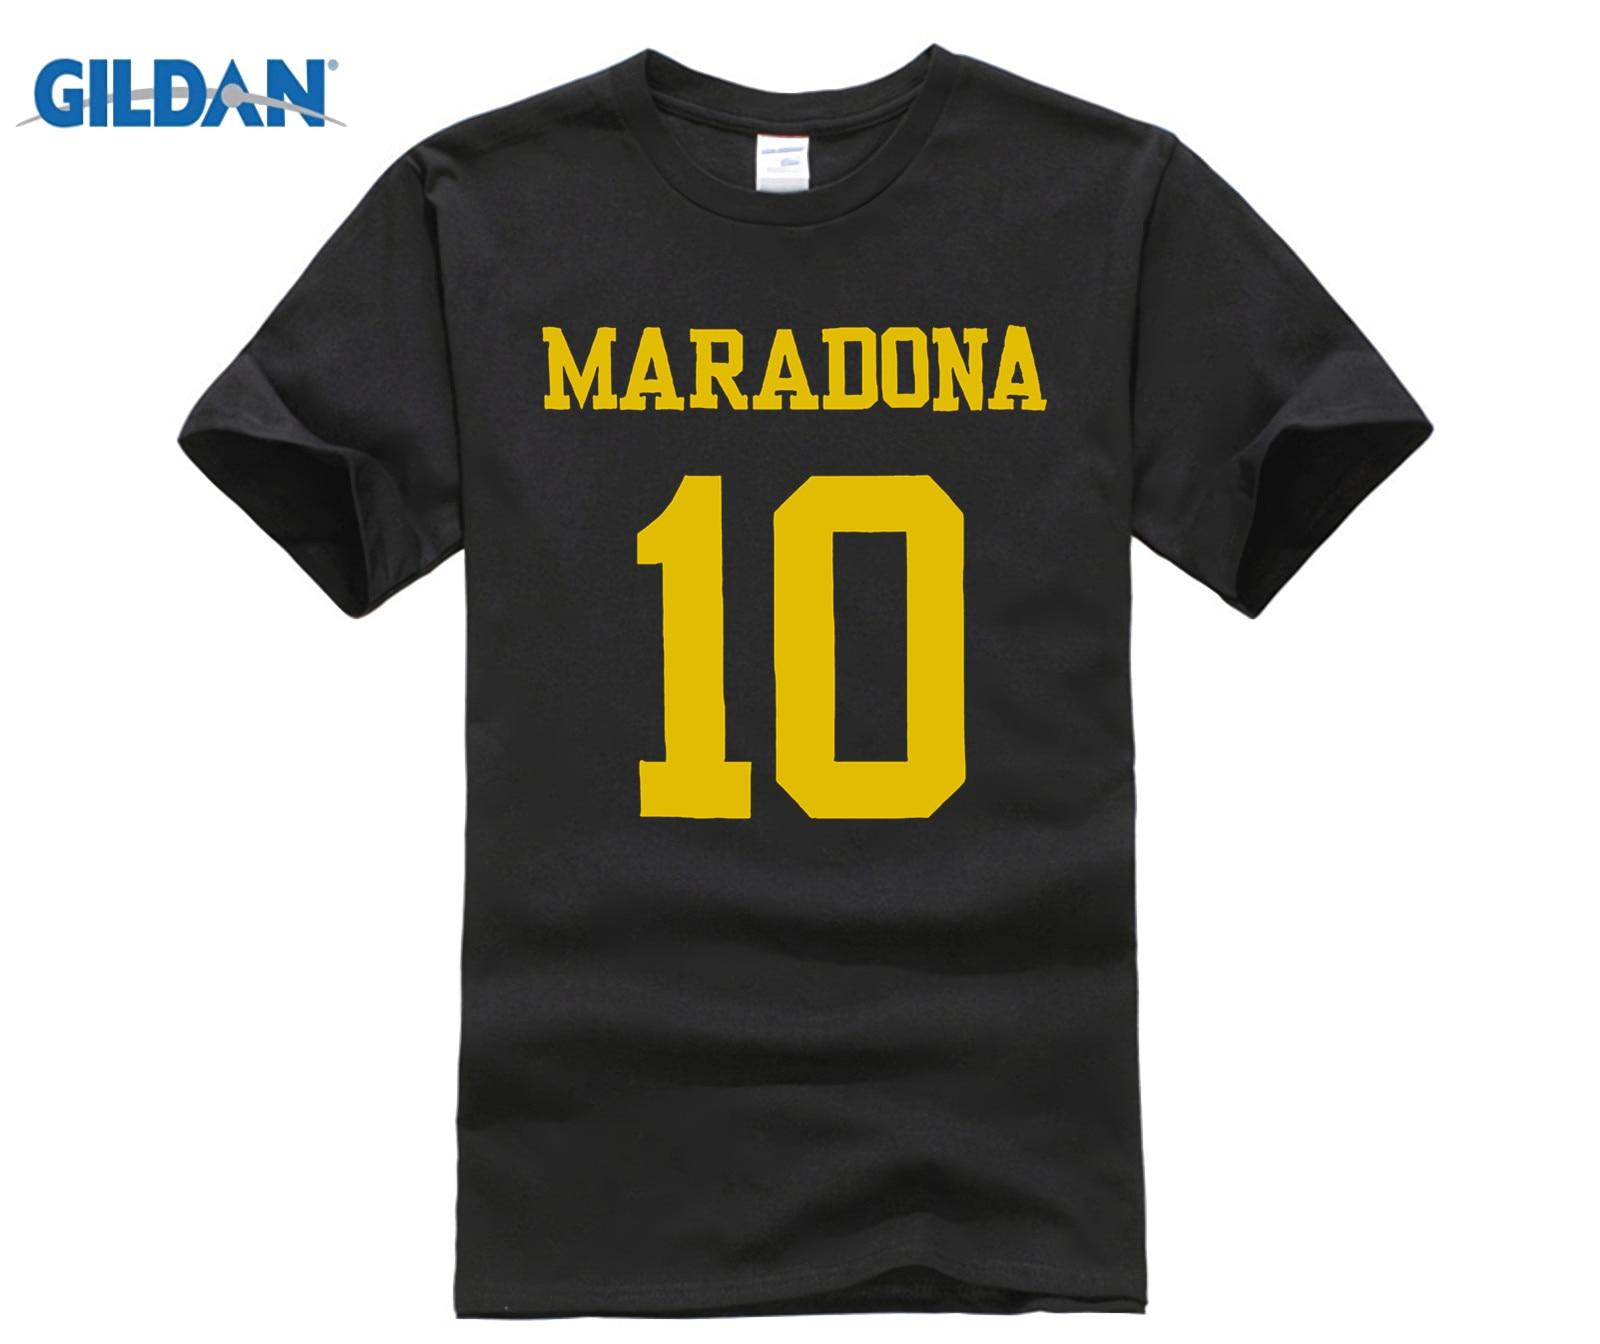 1d0d16f91 Detail Feedback Questions about GILDAN Diego Maradona Boca Juniors Legend  Hero T Shirt on Aliexpress.com   alibaba group